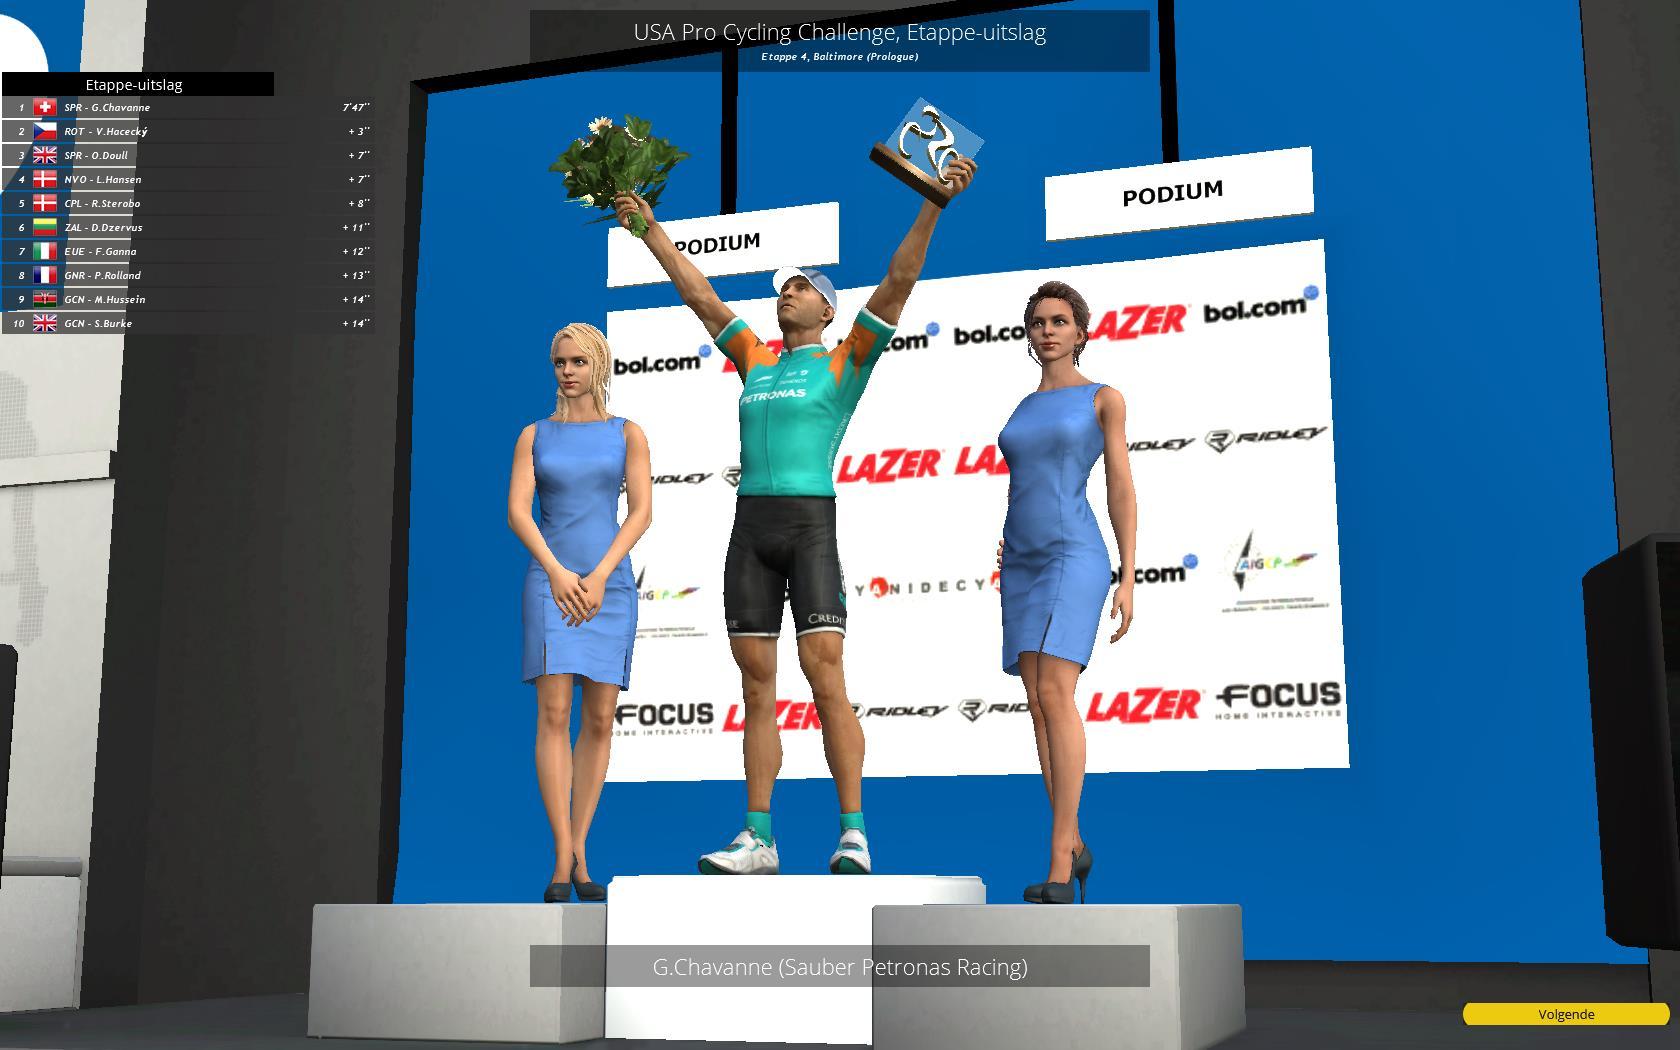 pcmdaily.com/images/mg/2018/Races/C2/USAPCC/4/PCM0041.jpg